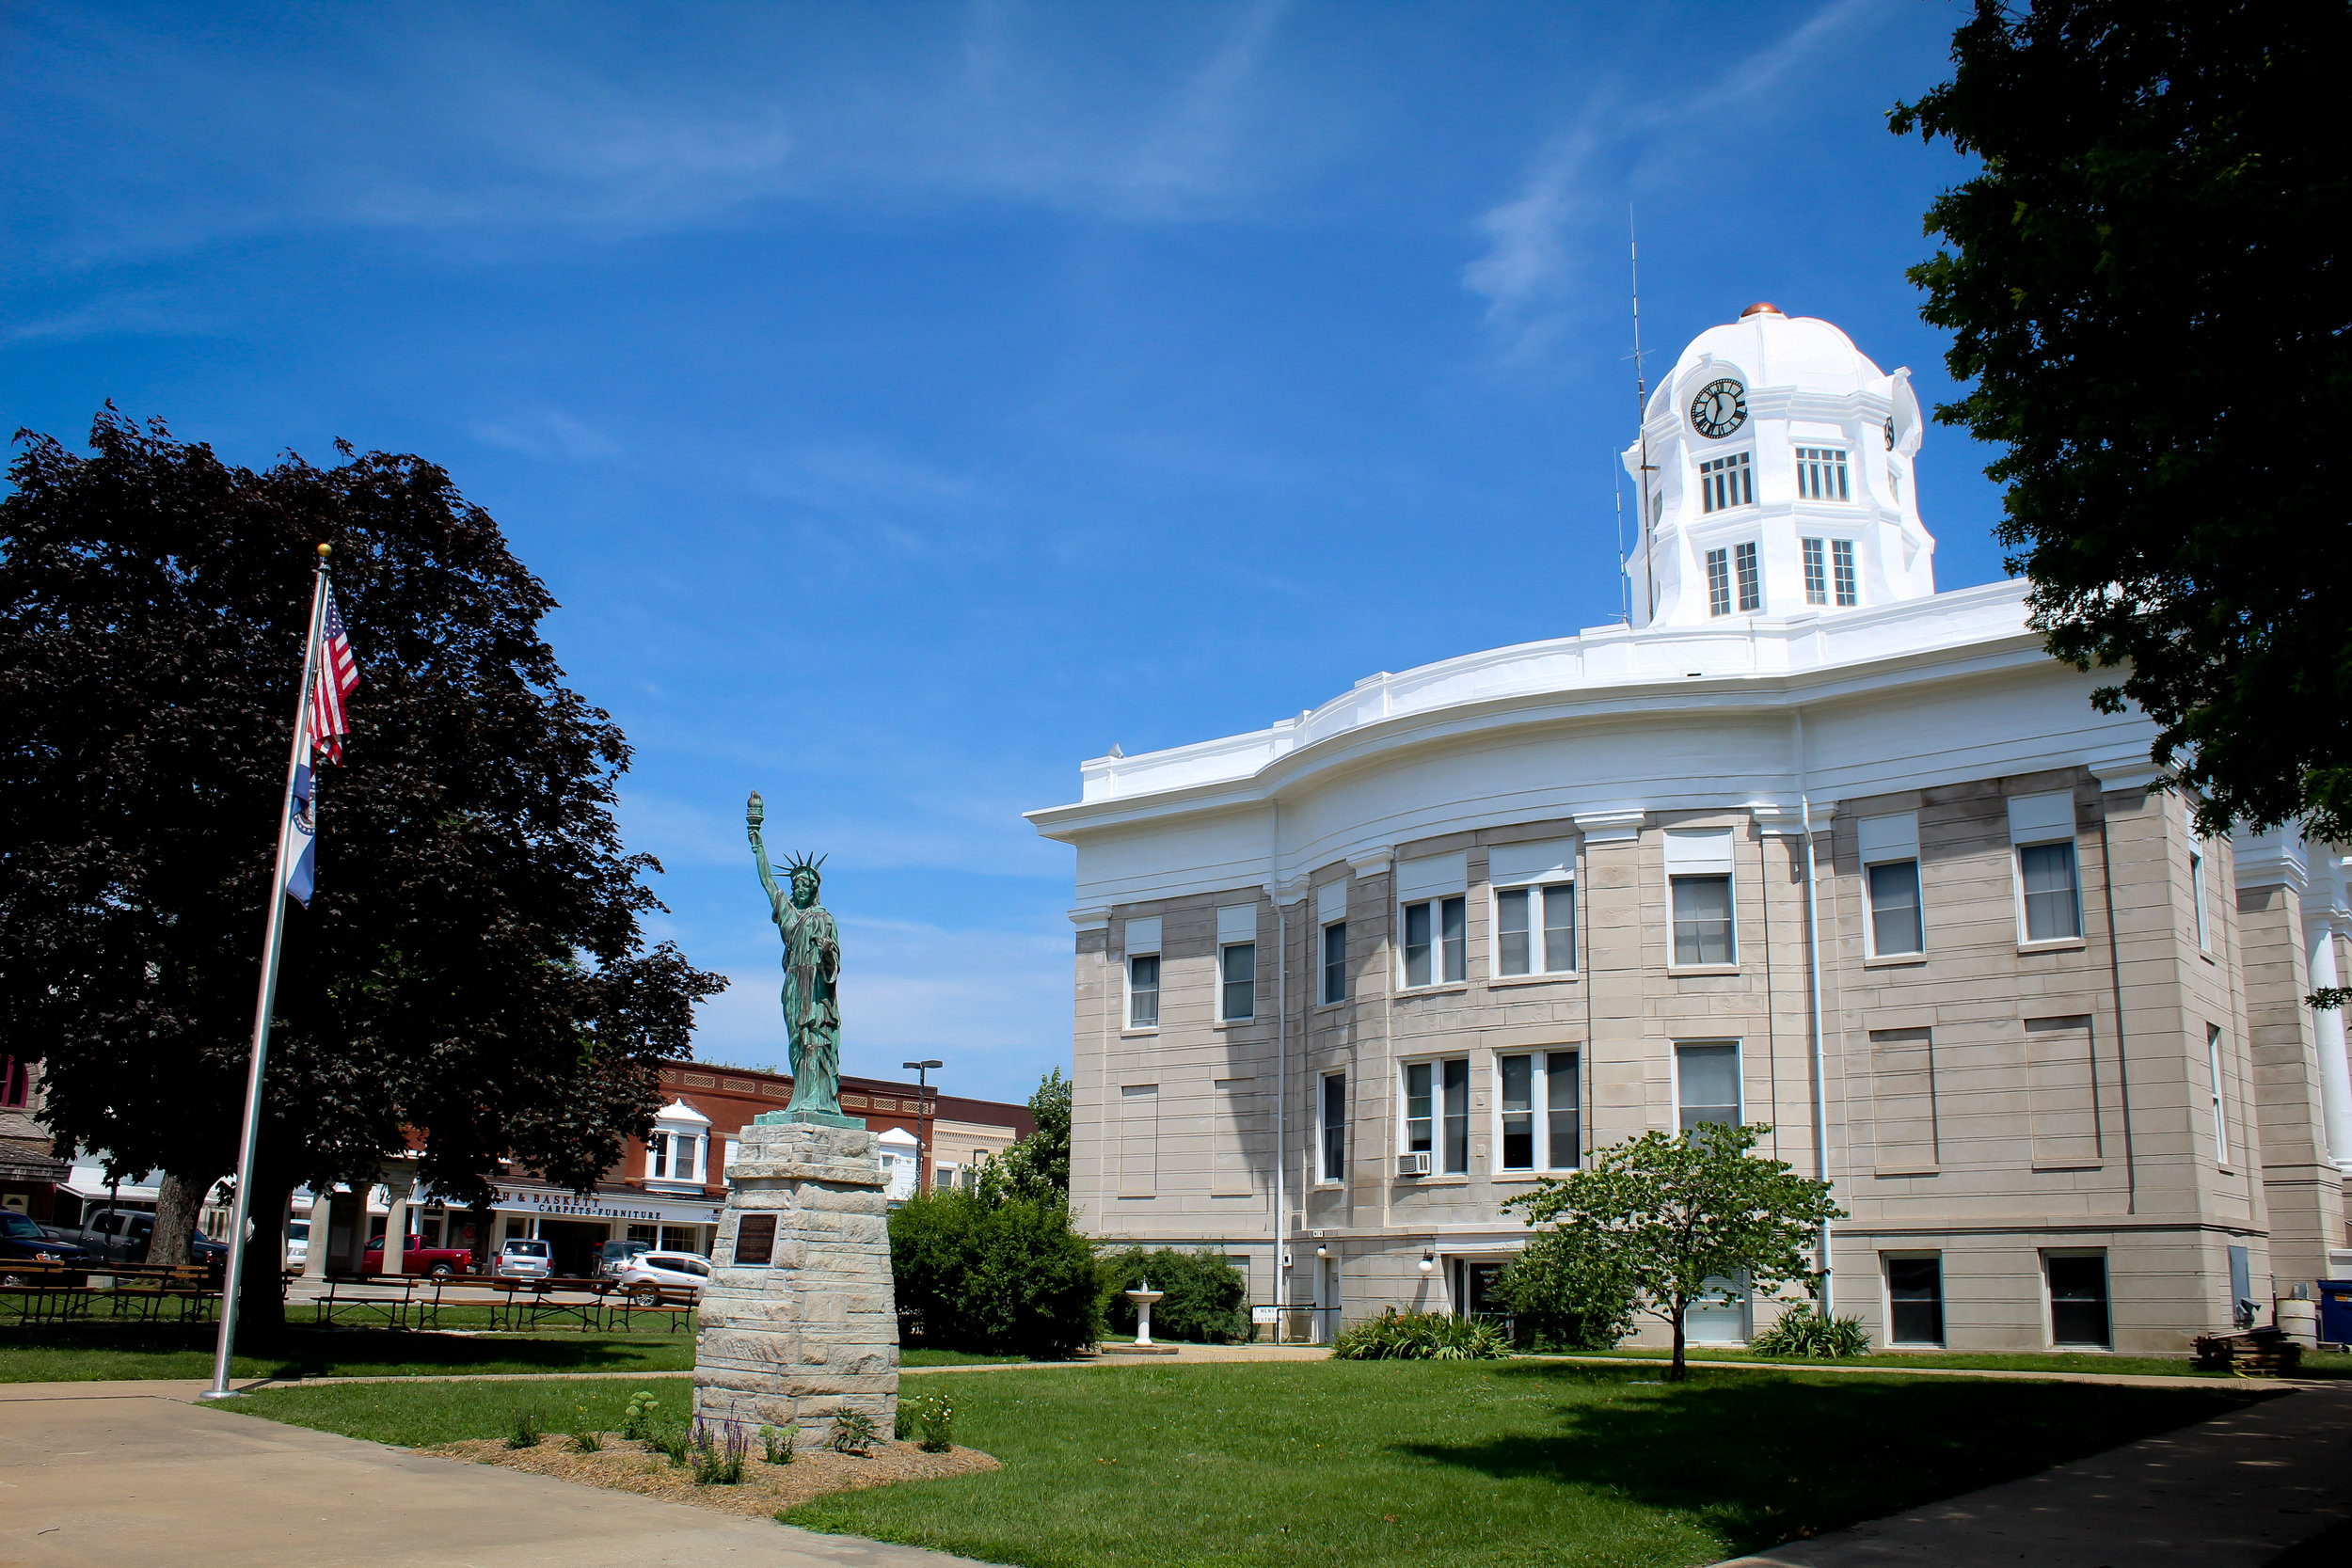 Scotland County Courthouse, Memphis, Missouri